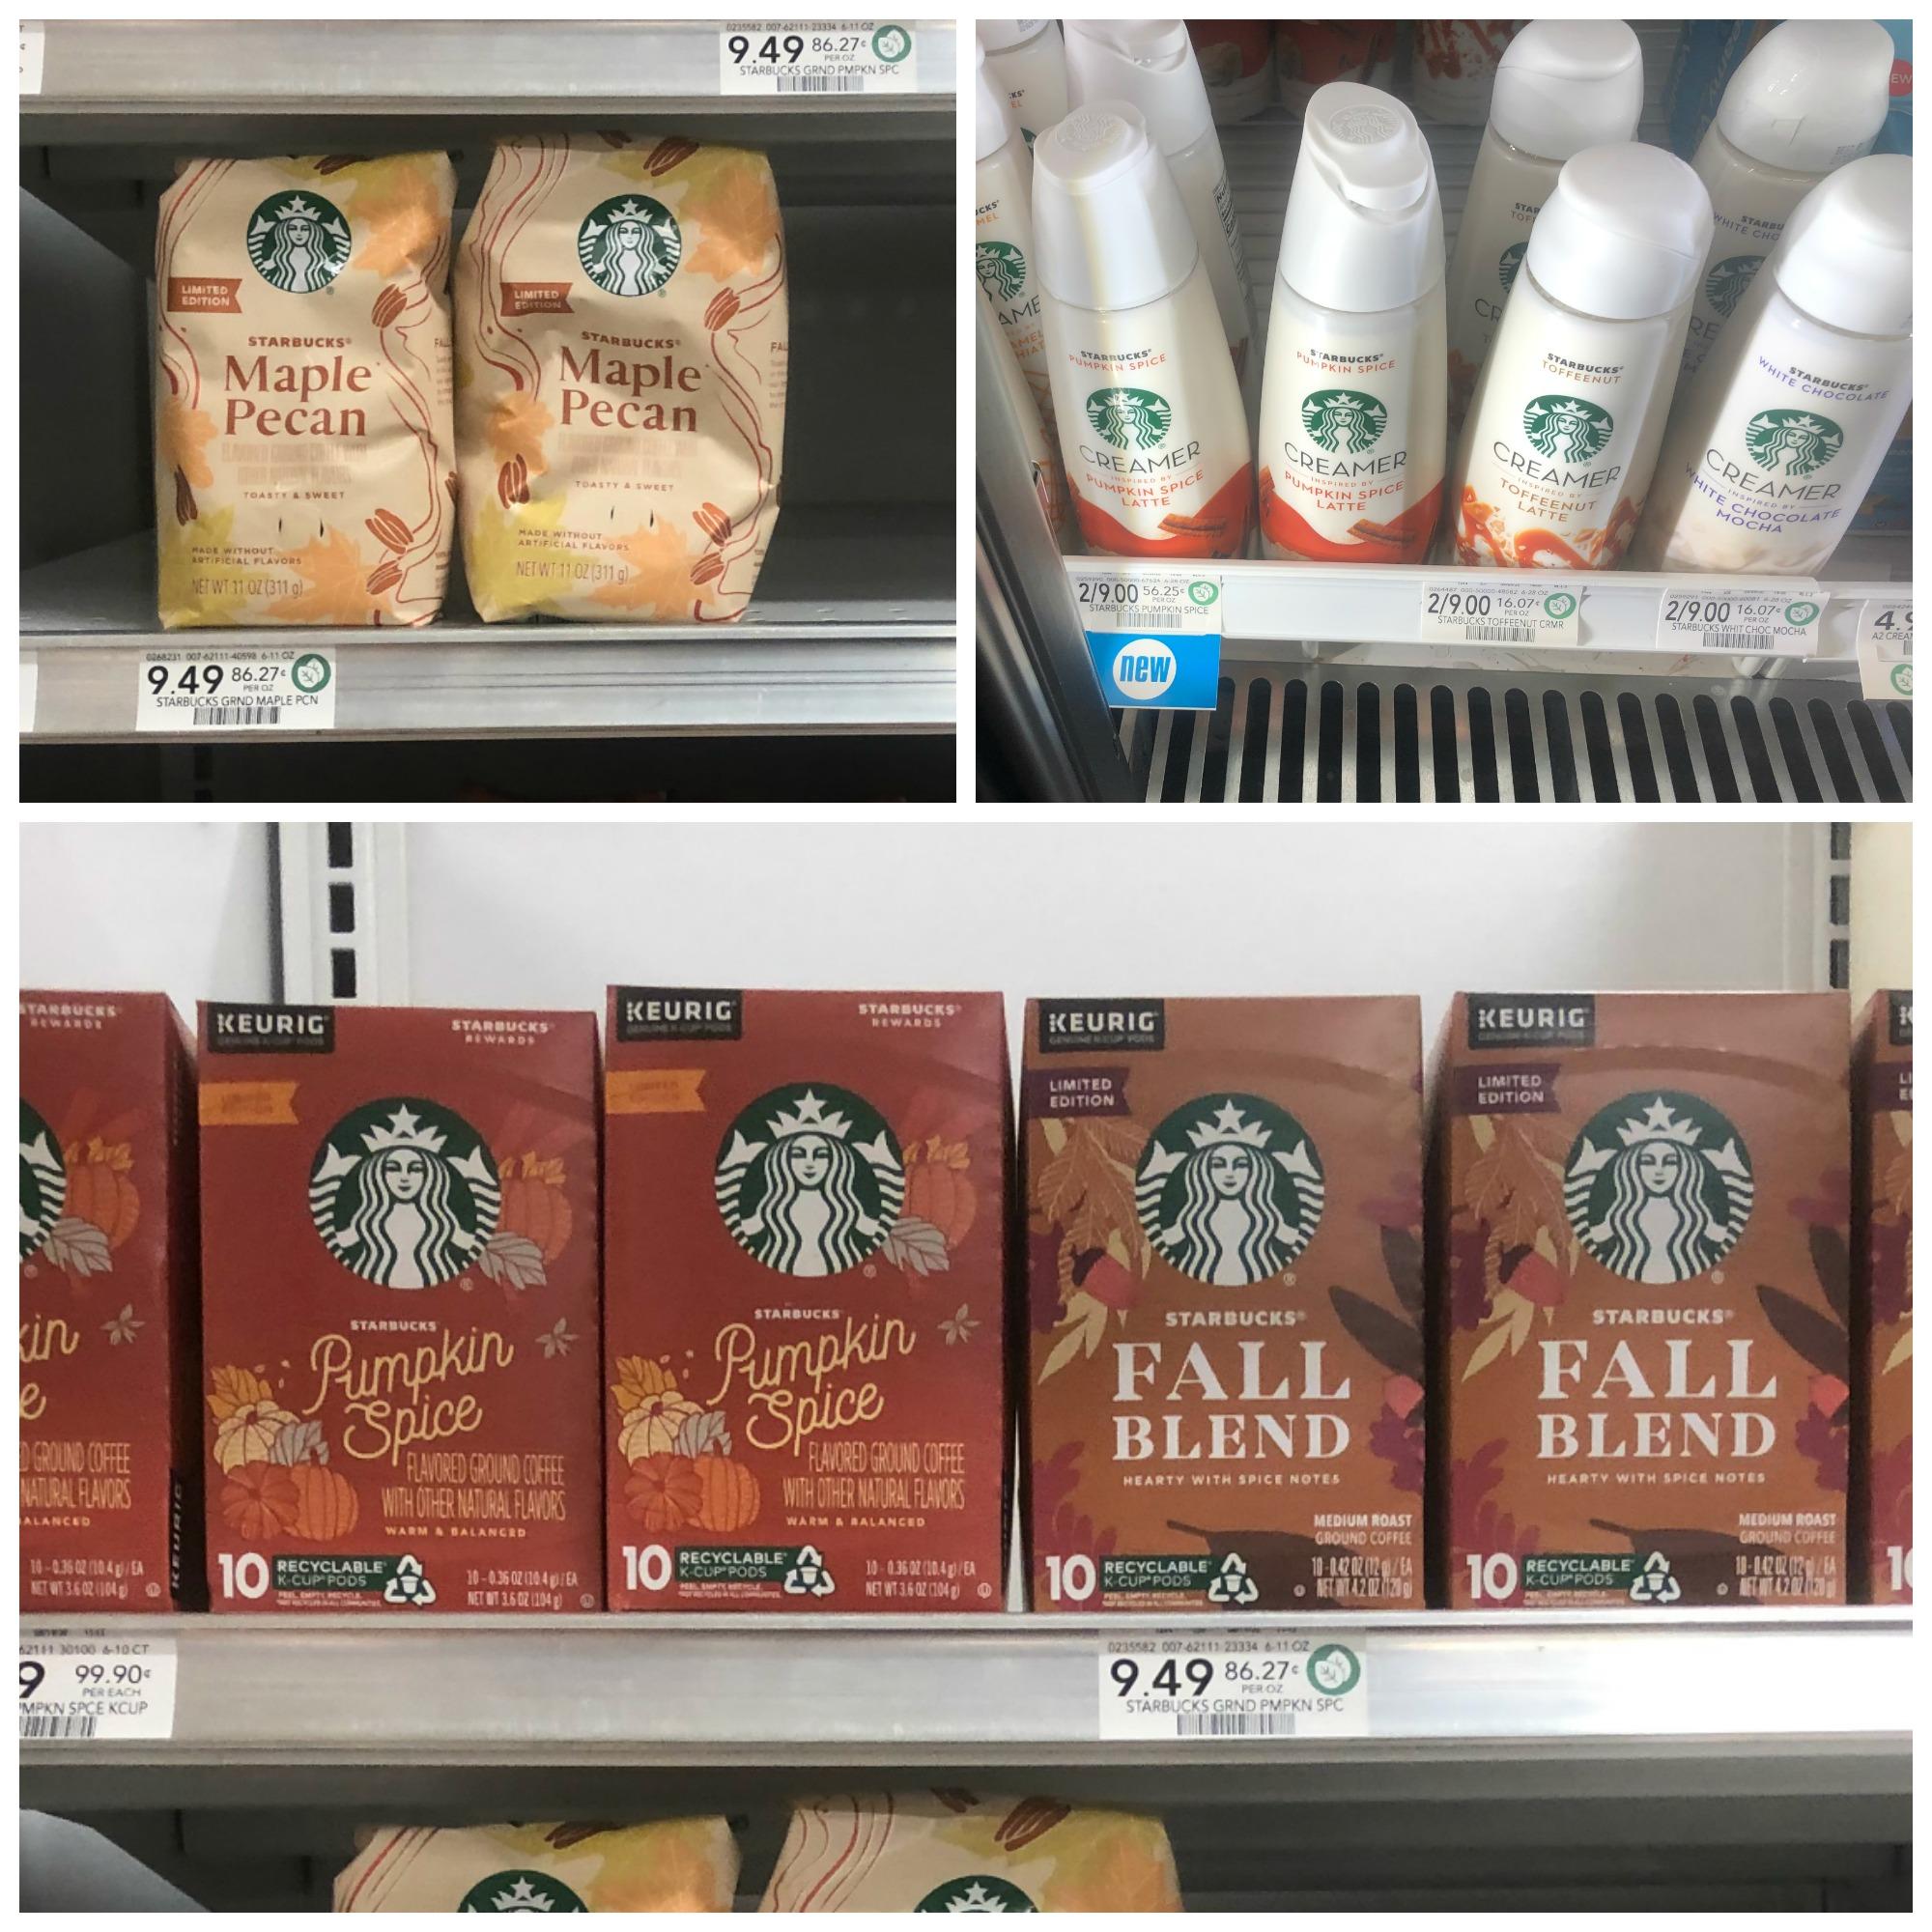 Savor That Fall Feeling & Enjoy BIG Savings On Starbucks Coffee & Creamer At Publix on I Heart Publix